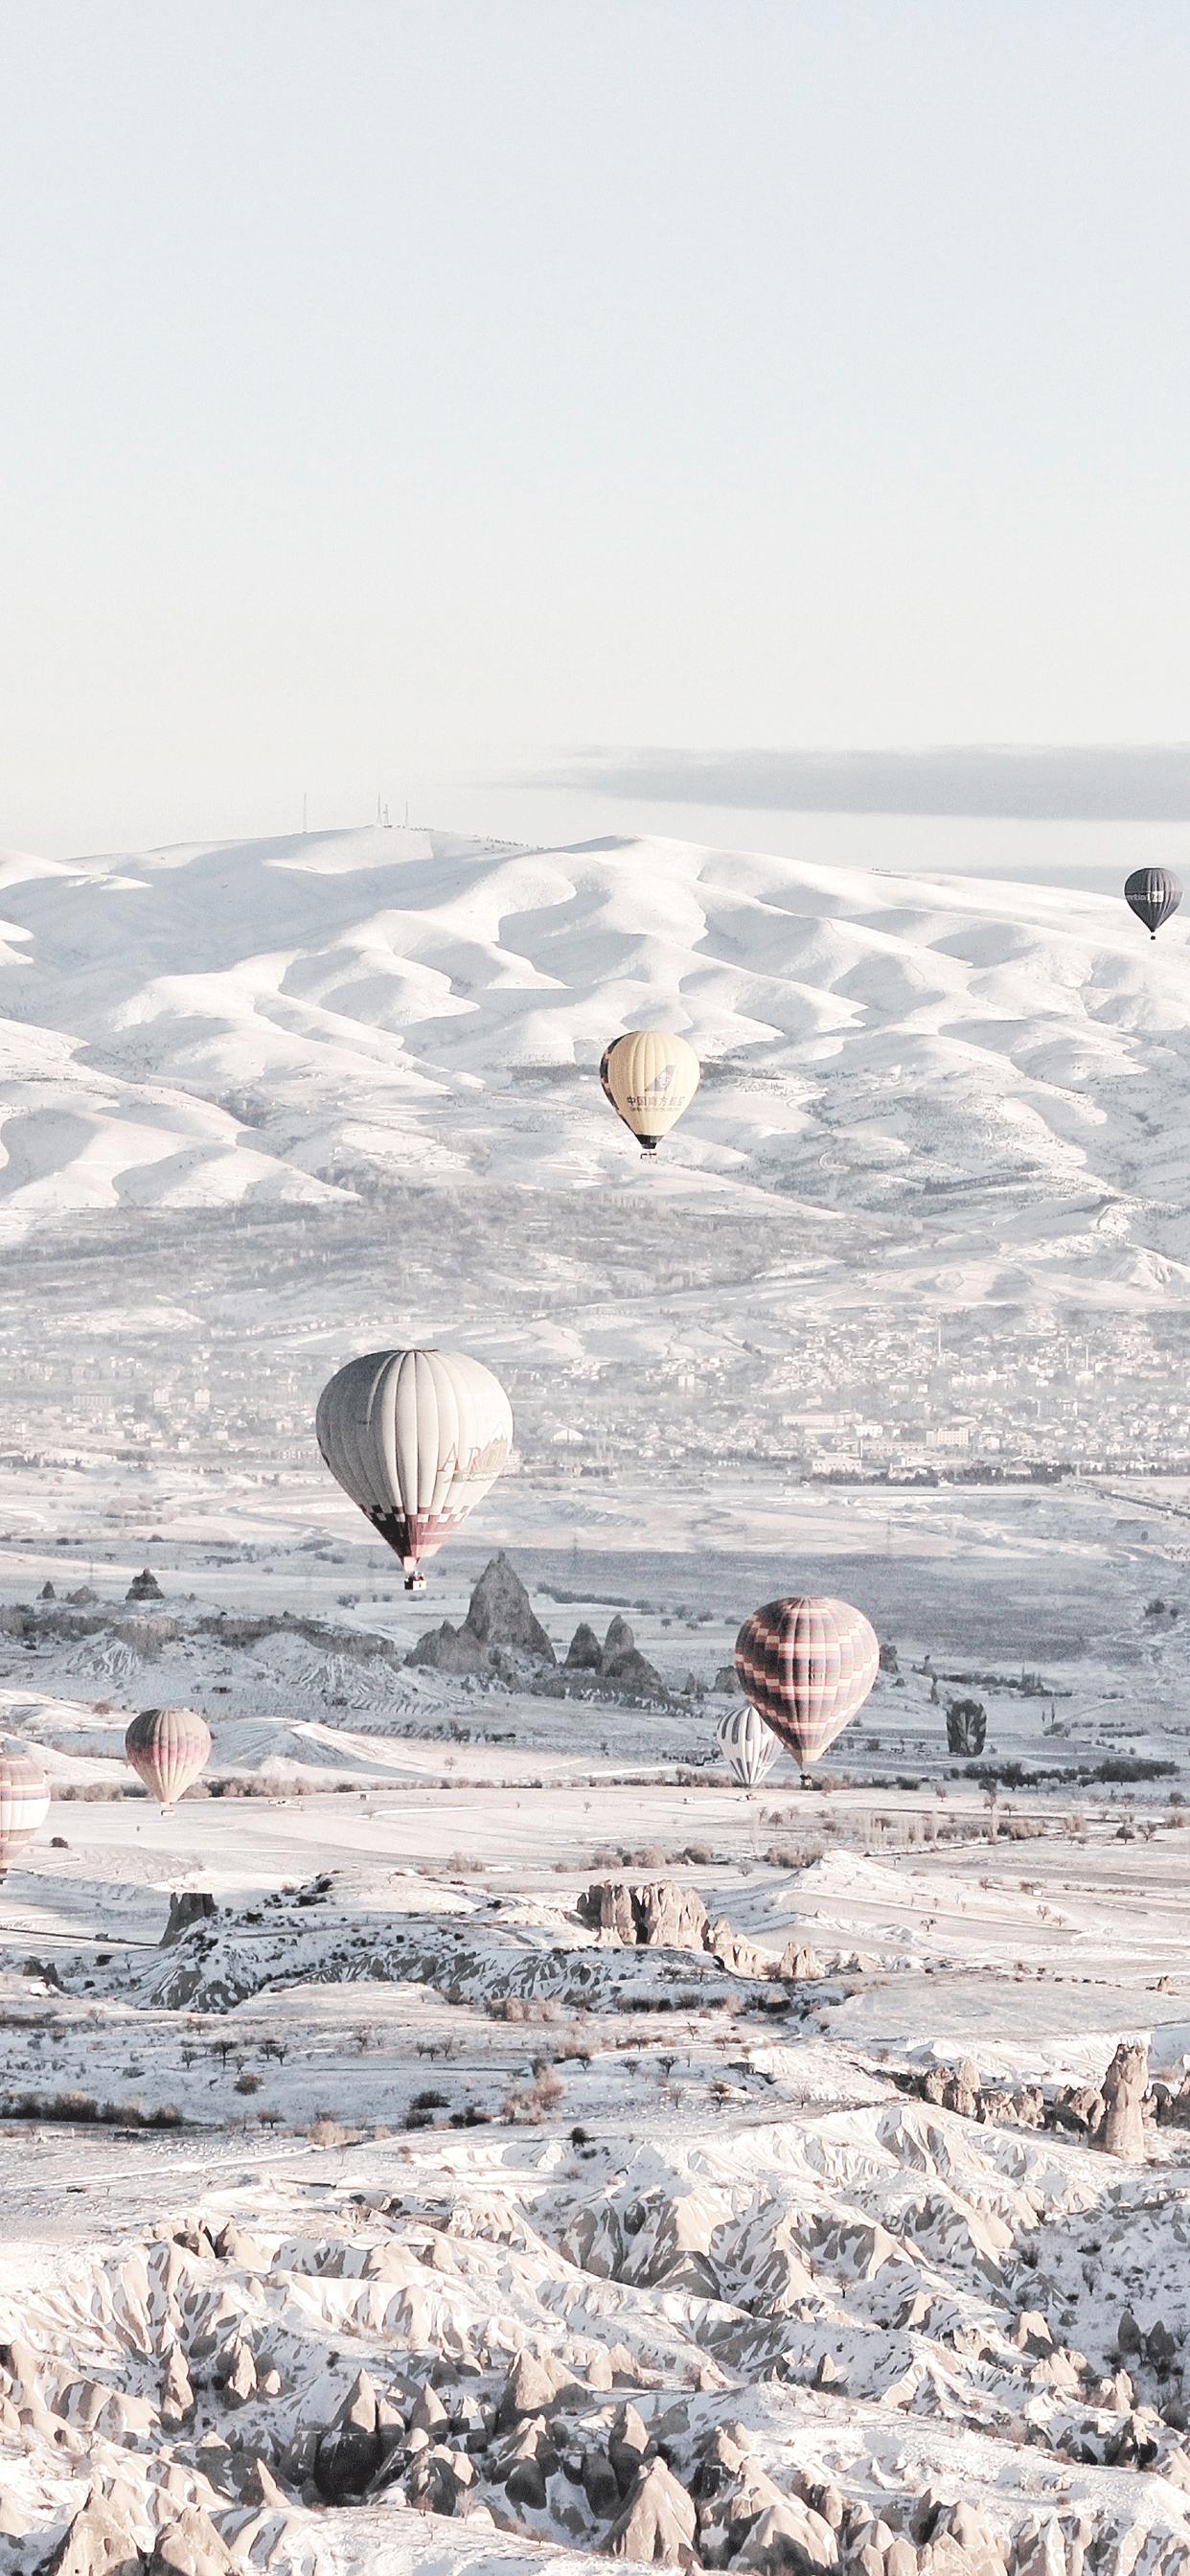 iPhone wallpaper turkey snow mountains Fonds d'écran iPhone du 04/03/2019